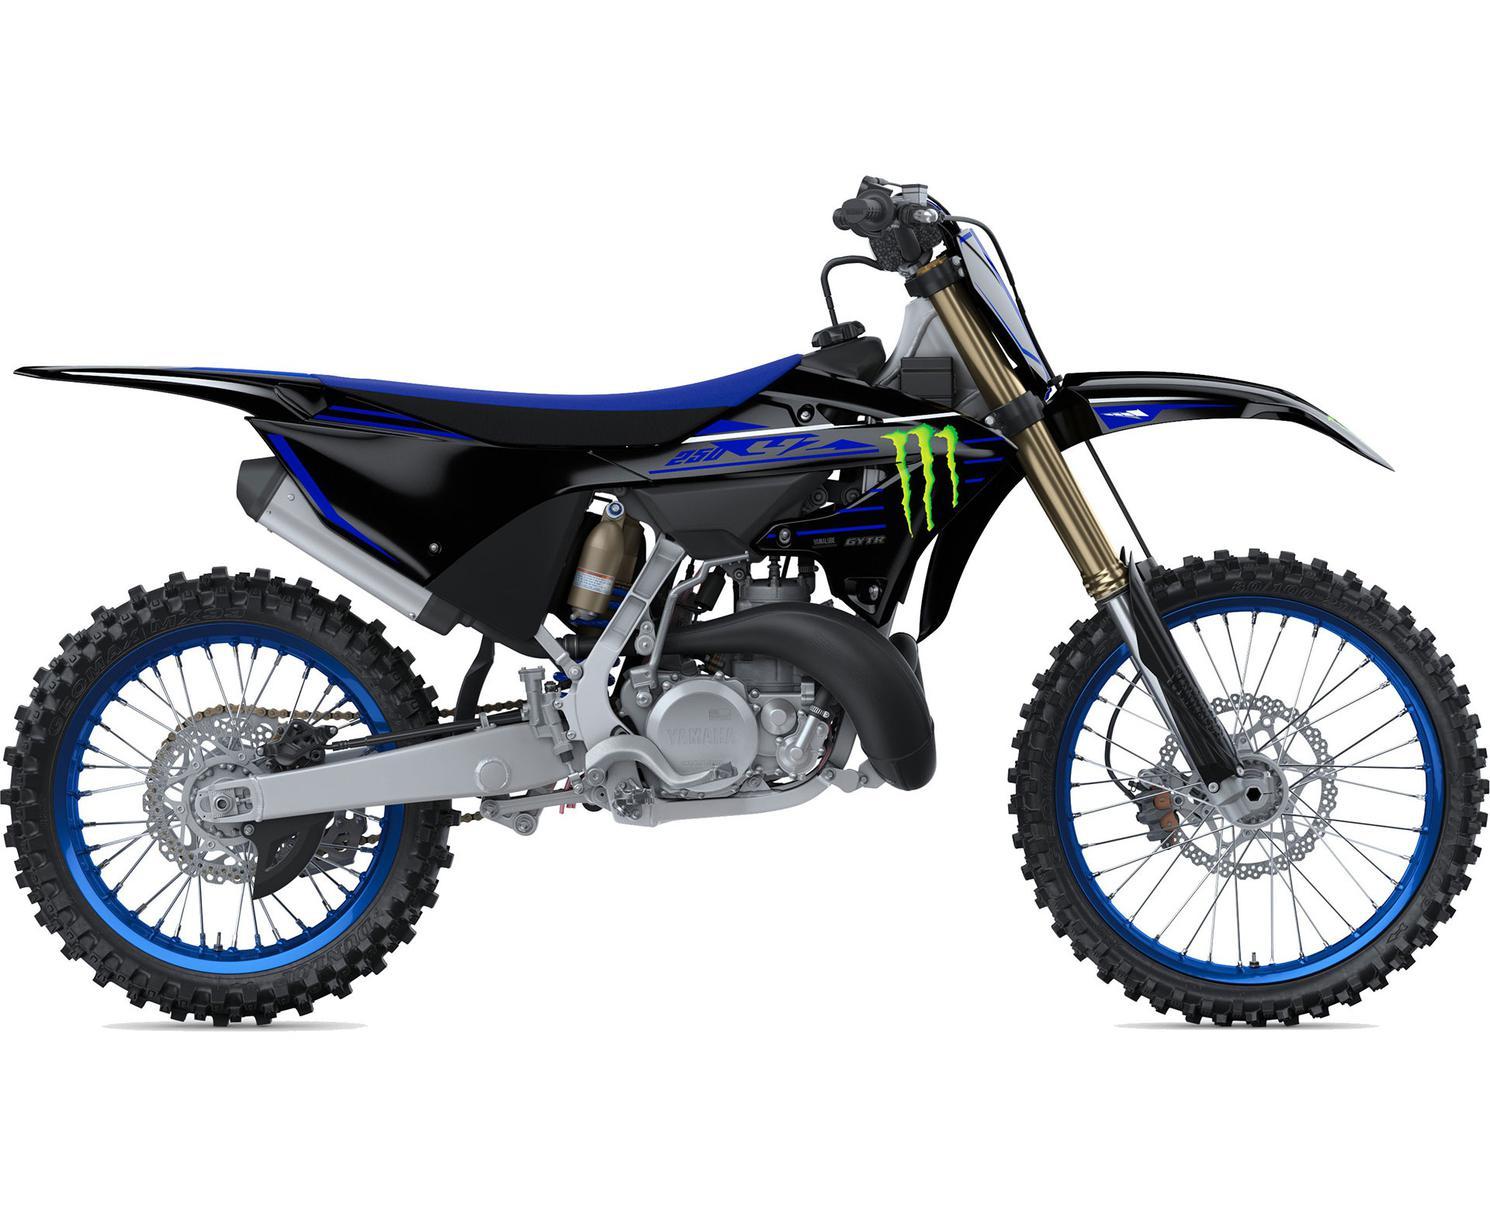 Yamaha YZ250 Motif Monster Energy Yamaha Racing 2022